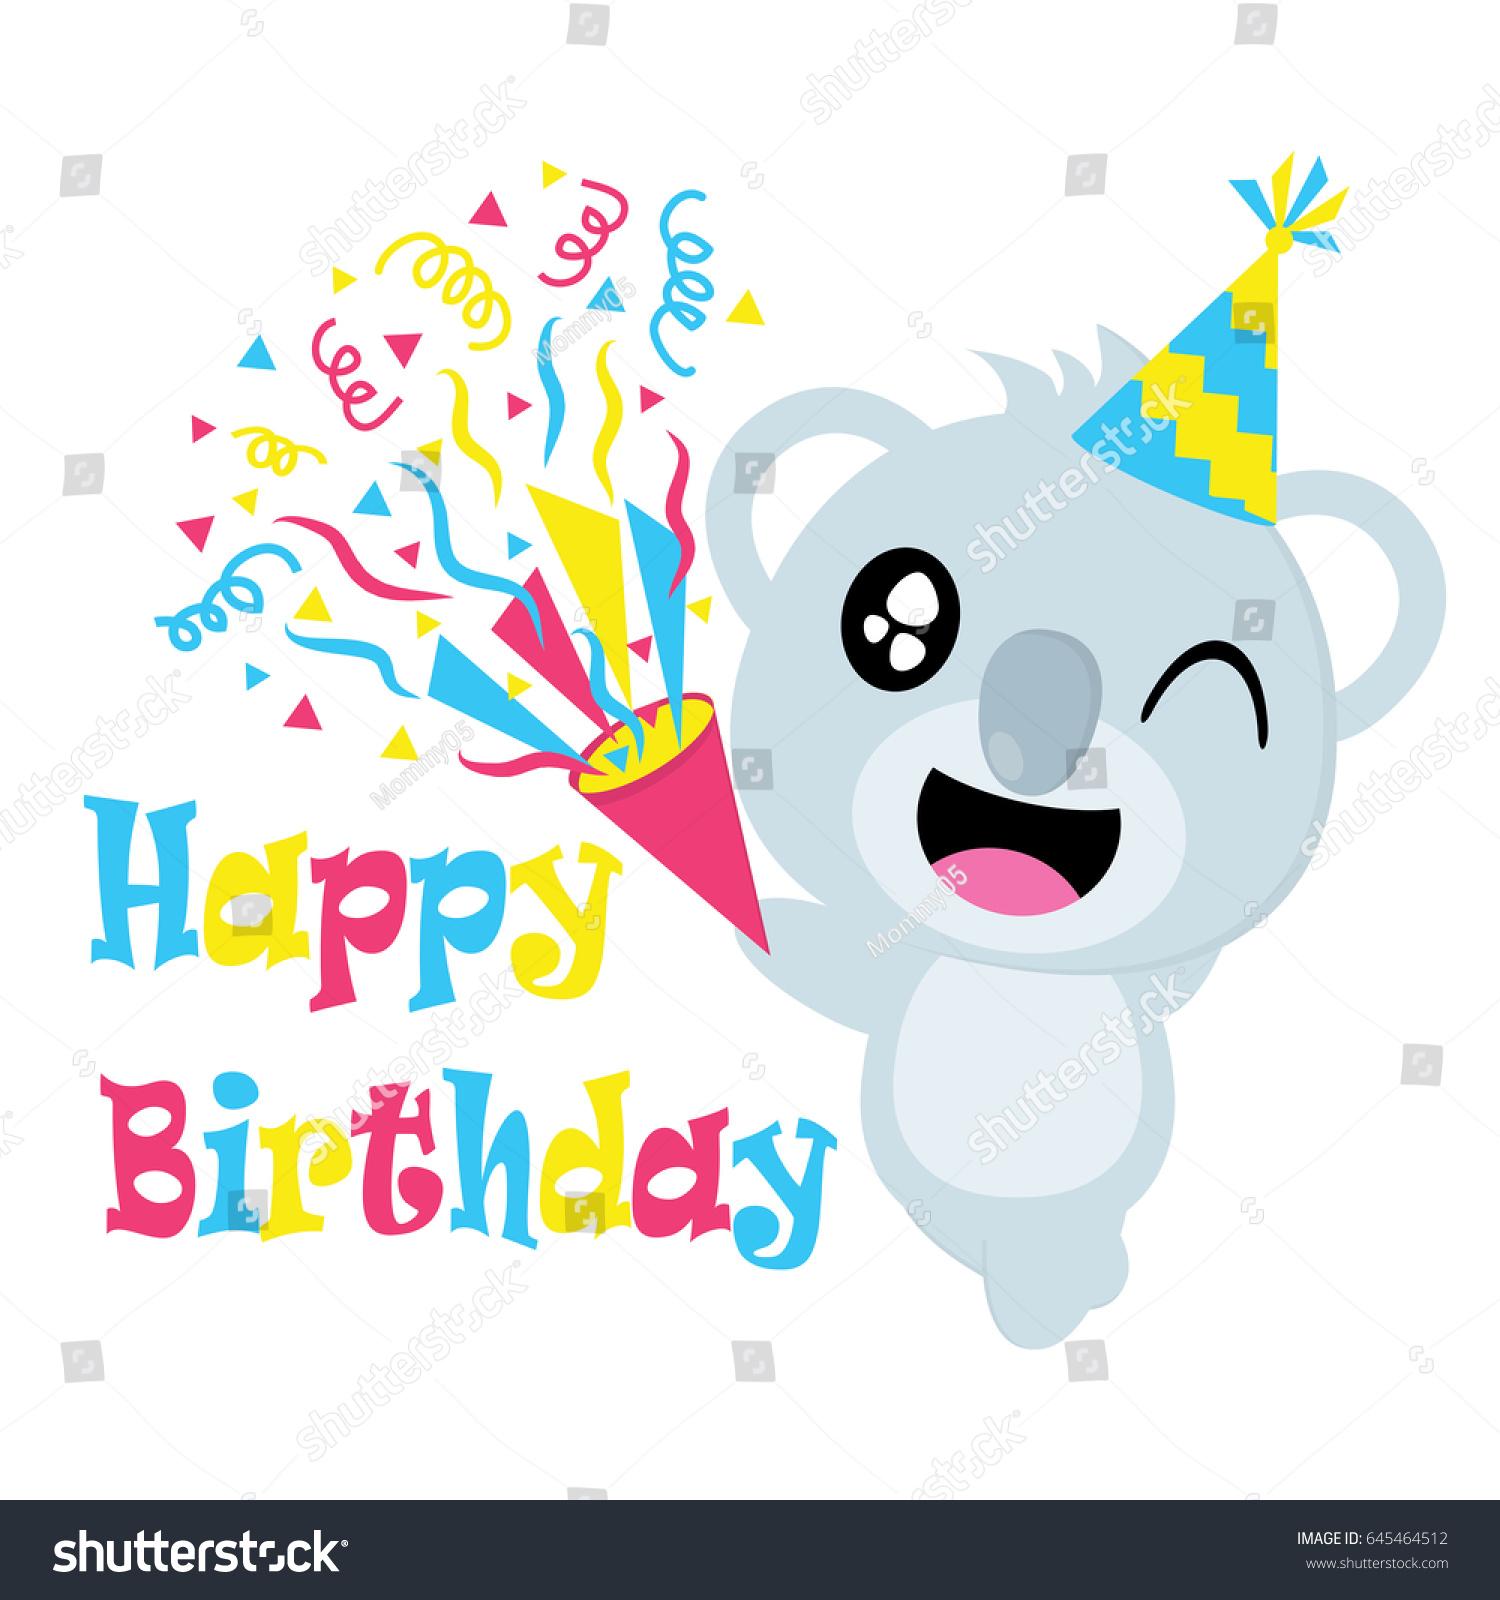 Most Inspiring Wallpaper Koala Cartoon - stock-vector-cute-koala-with-hat-vector-cartoon-birthday-postcard-wallpaper-and-greeting-card-t-shirt-design-645464512  Pic_94322   .jpg